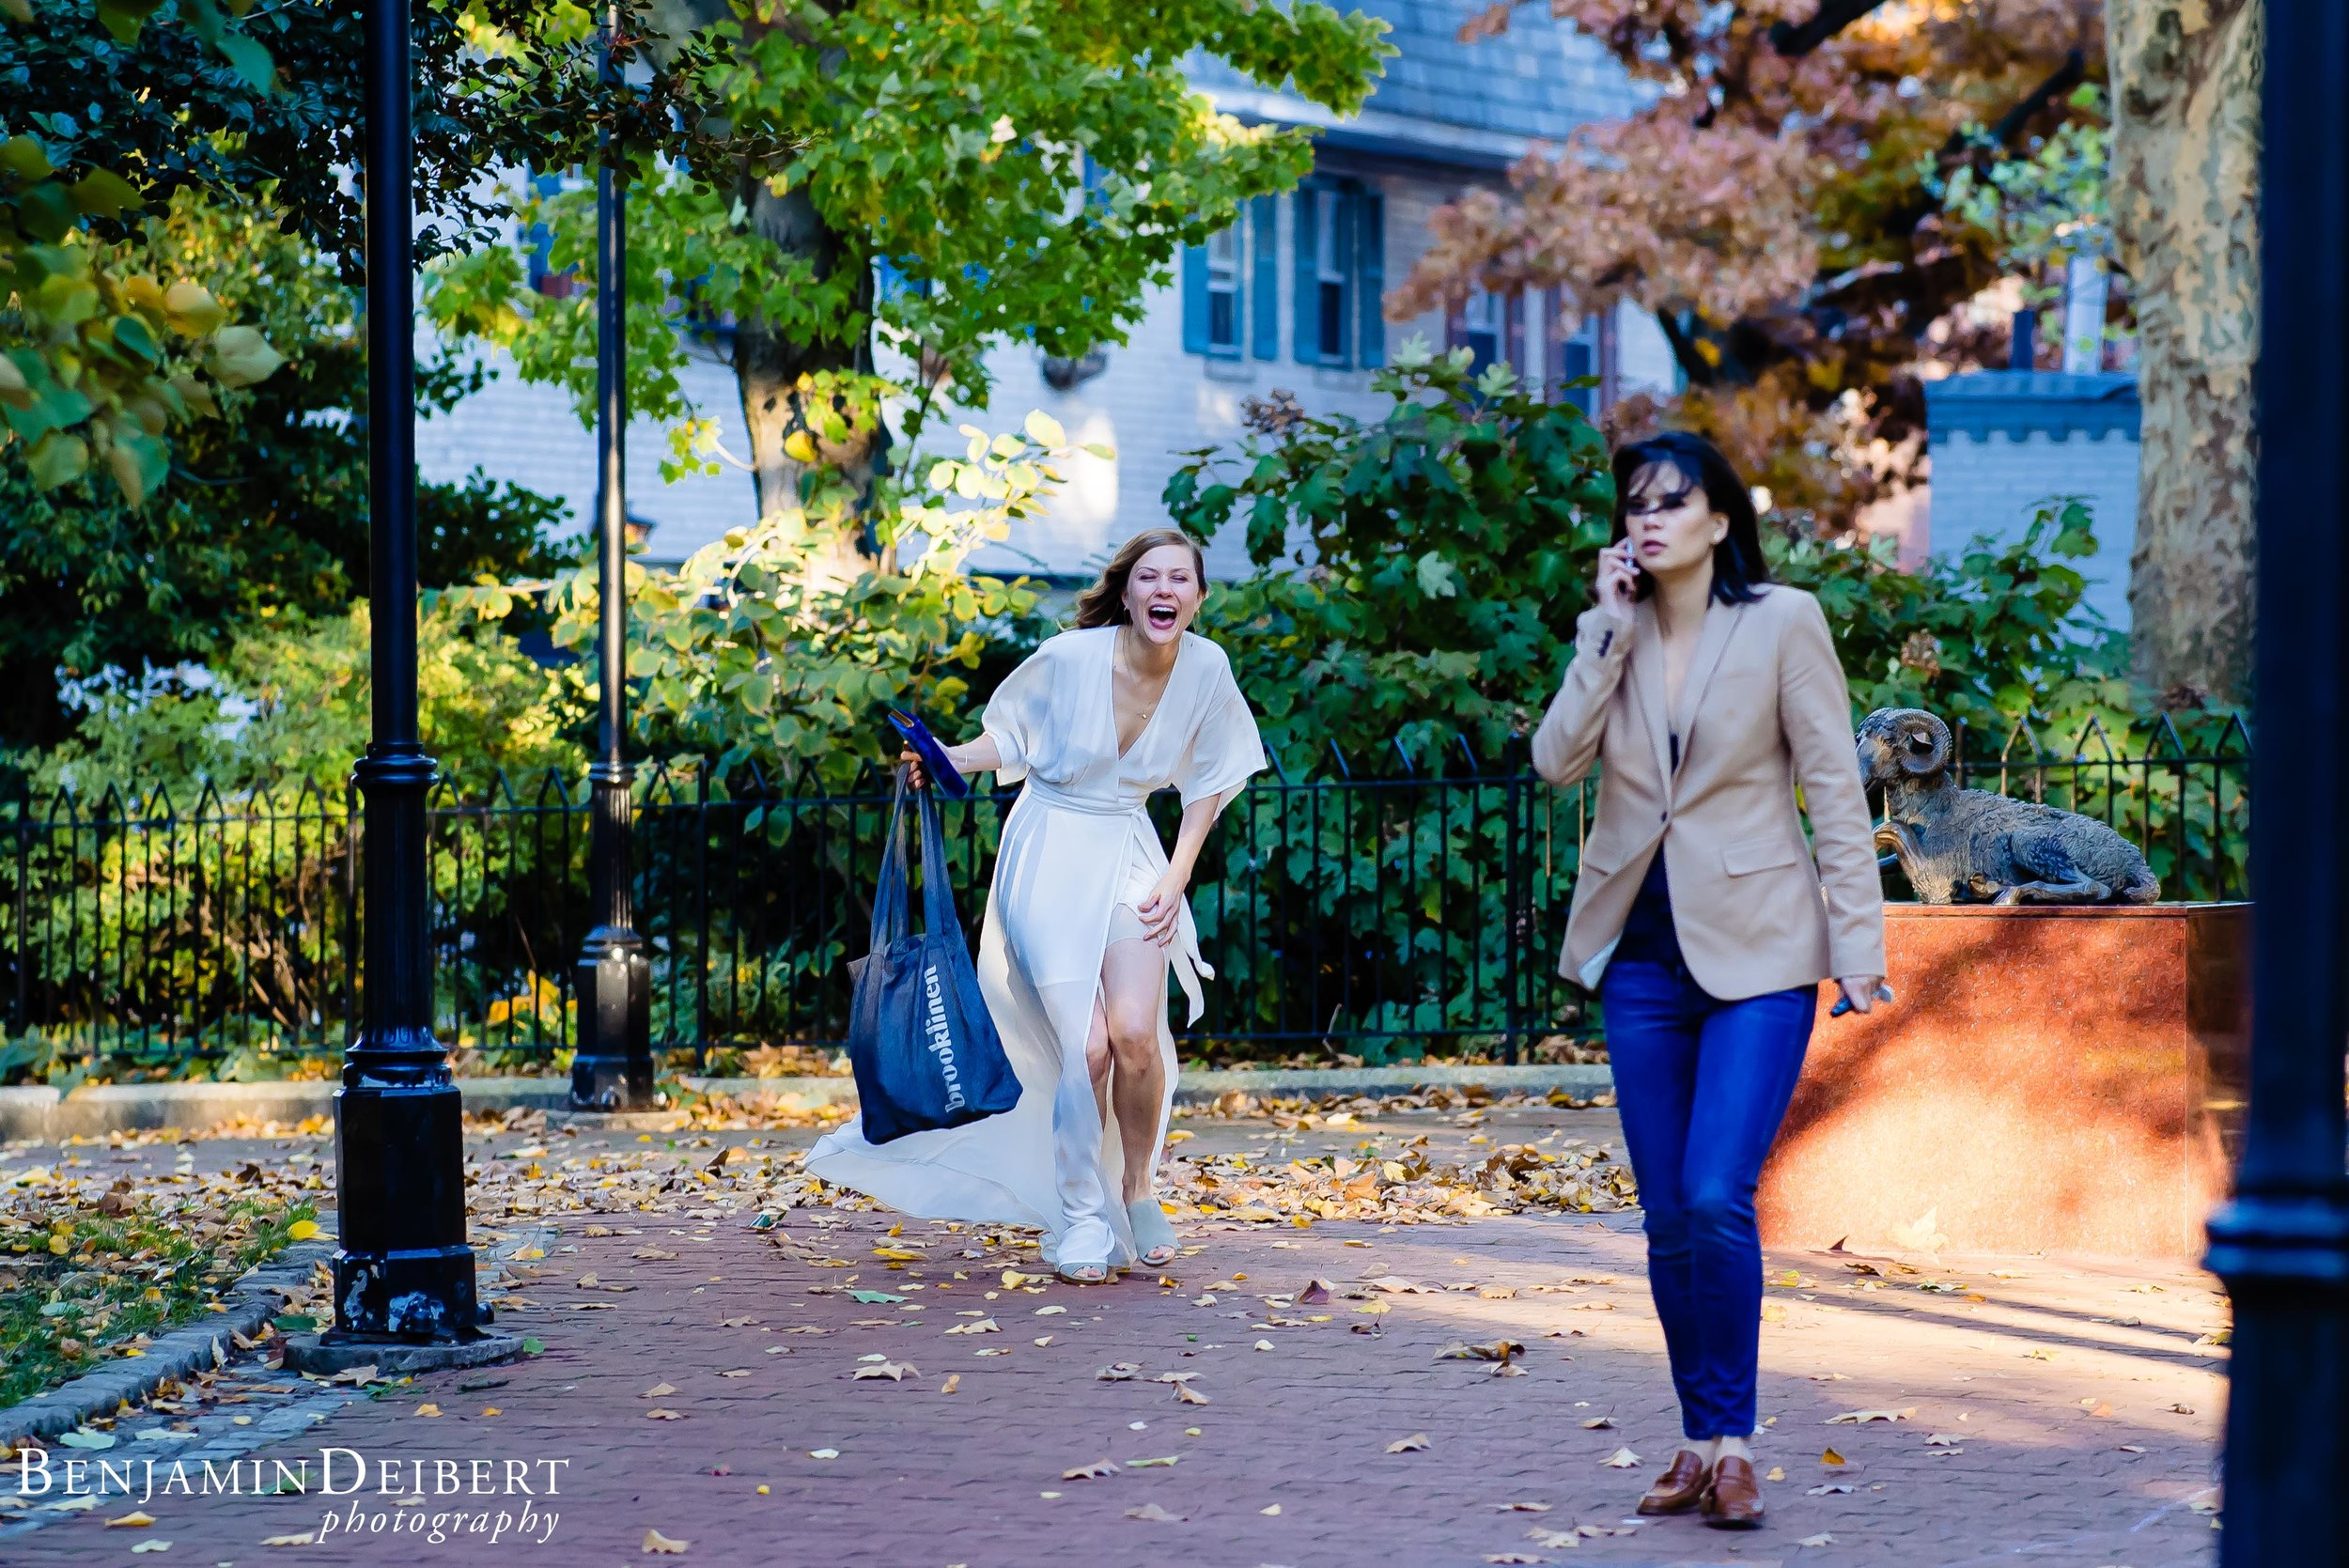 RosieandAvi_HoneysSitNEat_Wedding-3.jpg